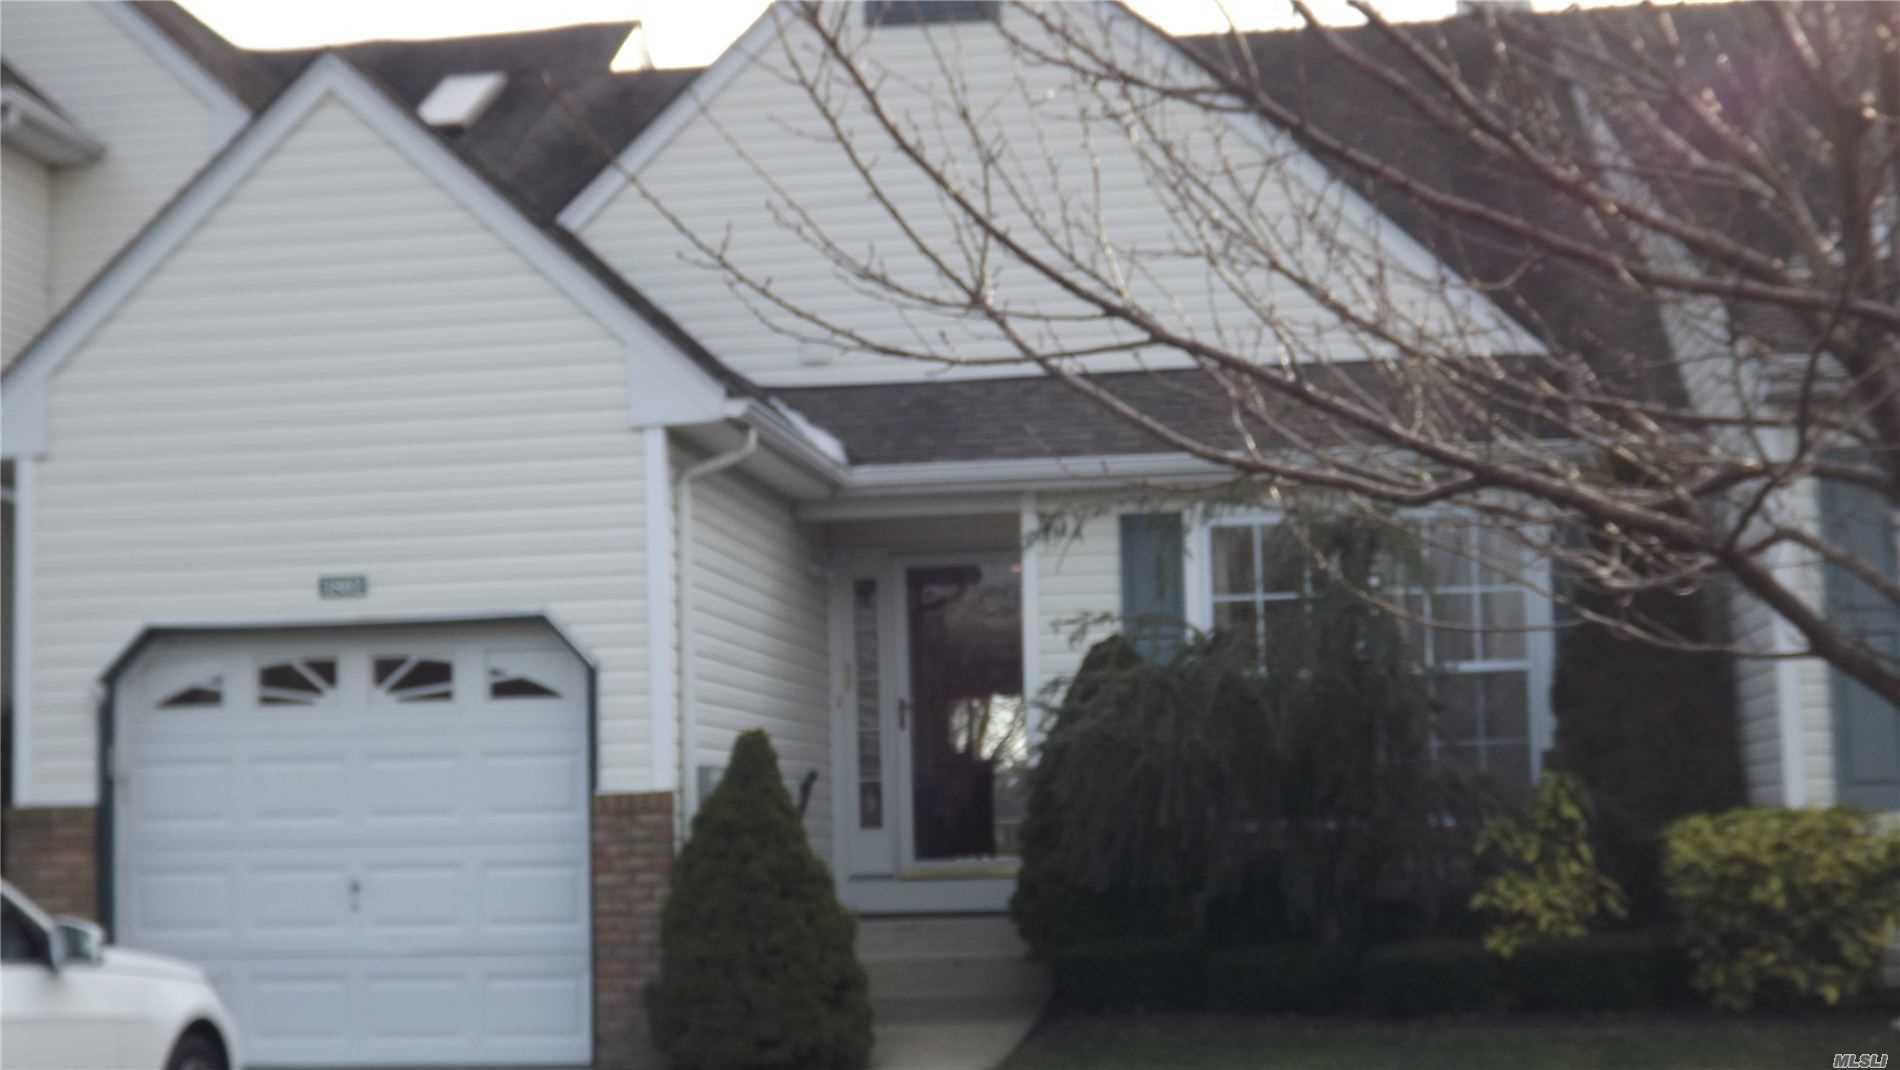 Property for sale at 1802 Eve Ann Drive, Pt.Jefferson Sta NY 11776, Pt.Jefferson Sta,  New York 11776